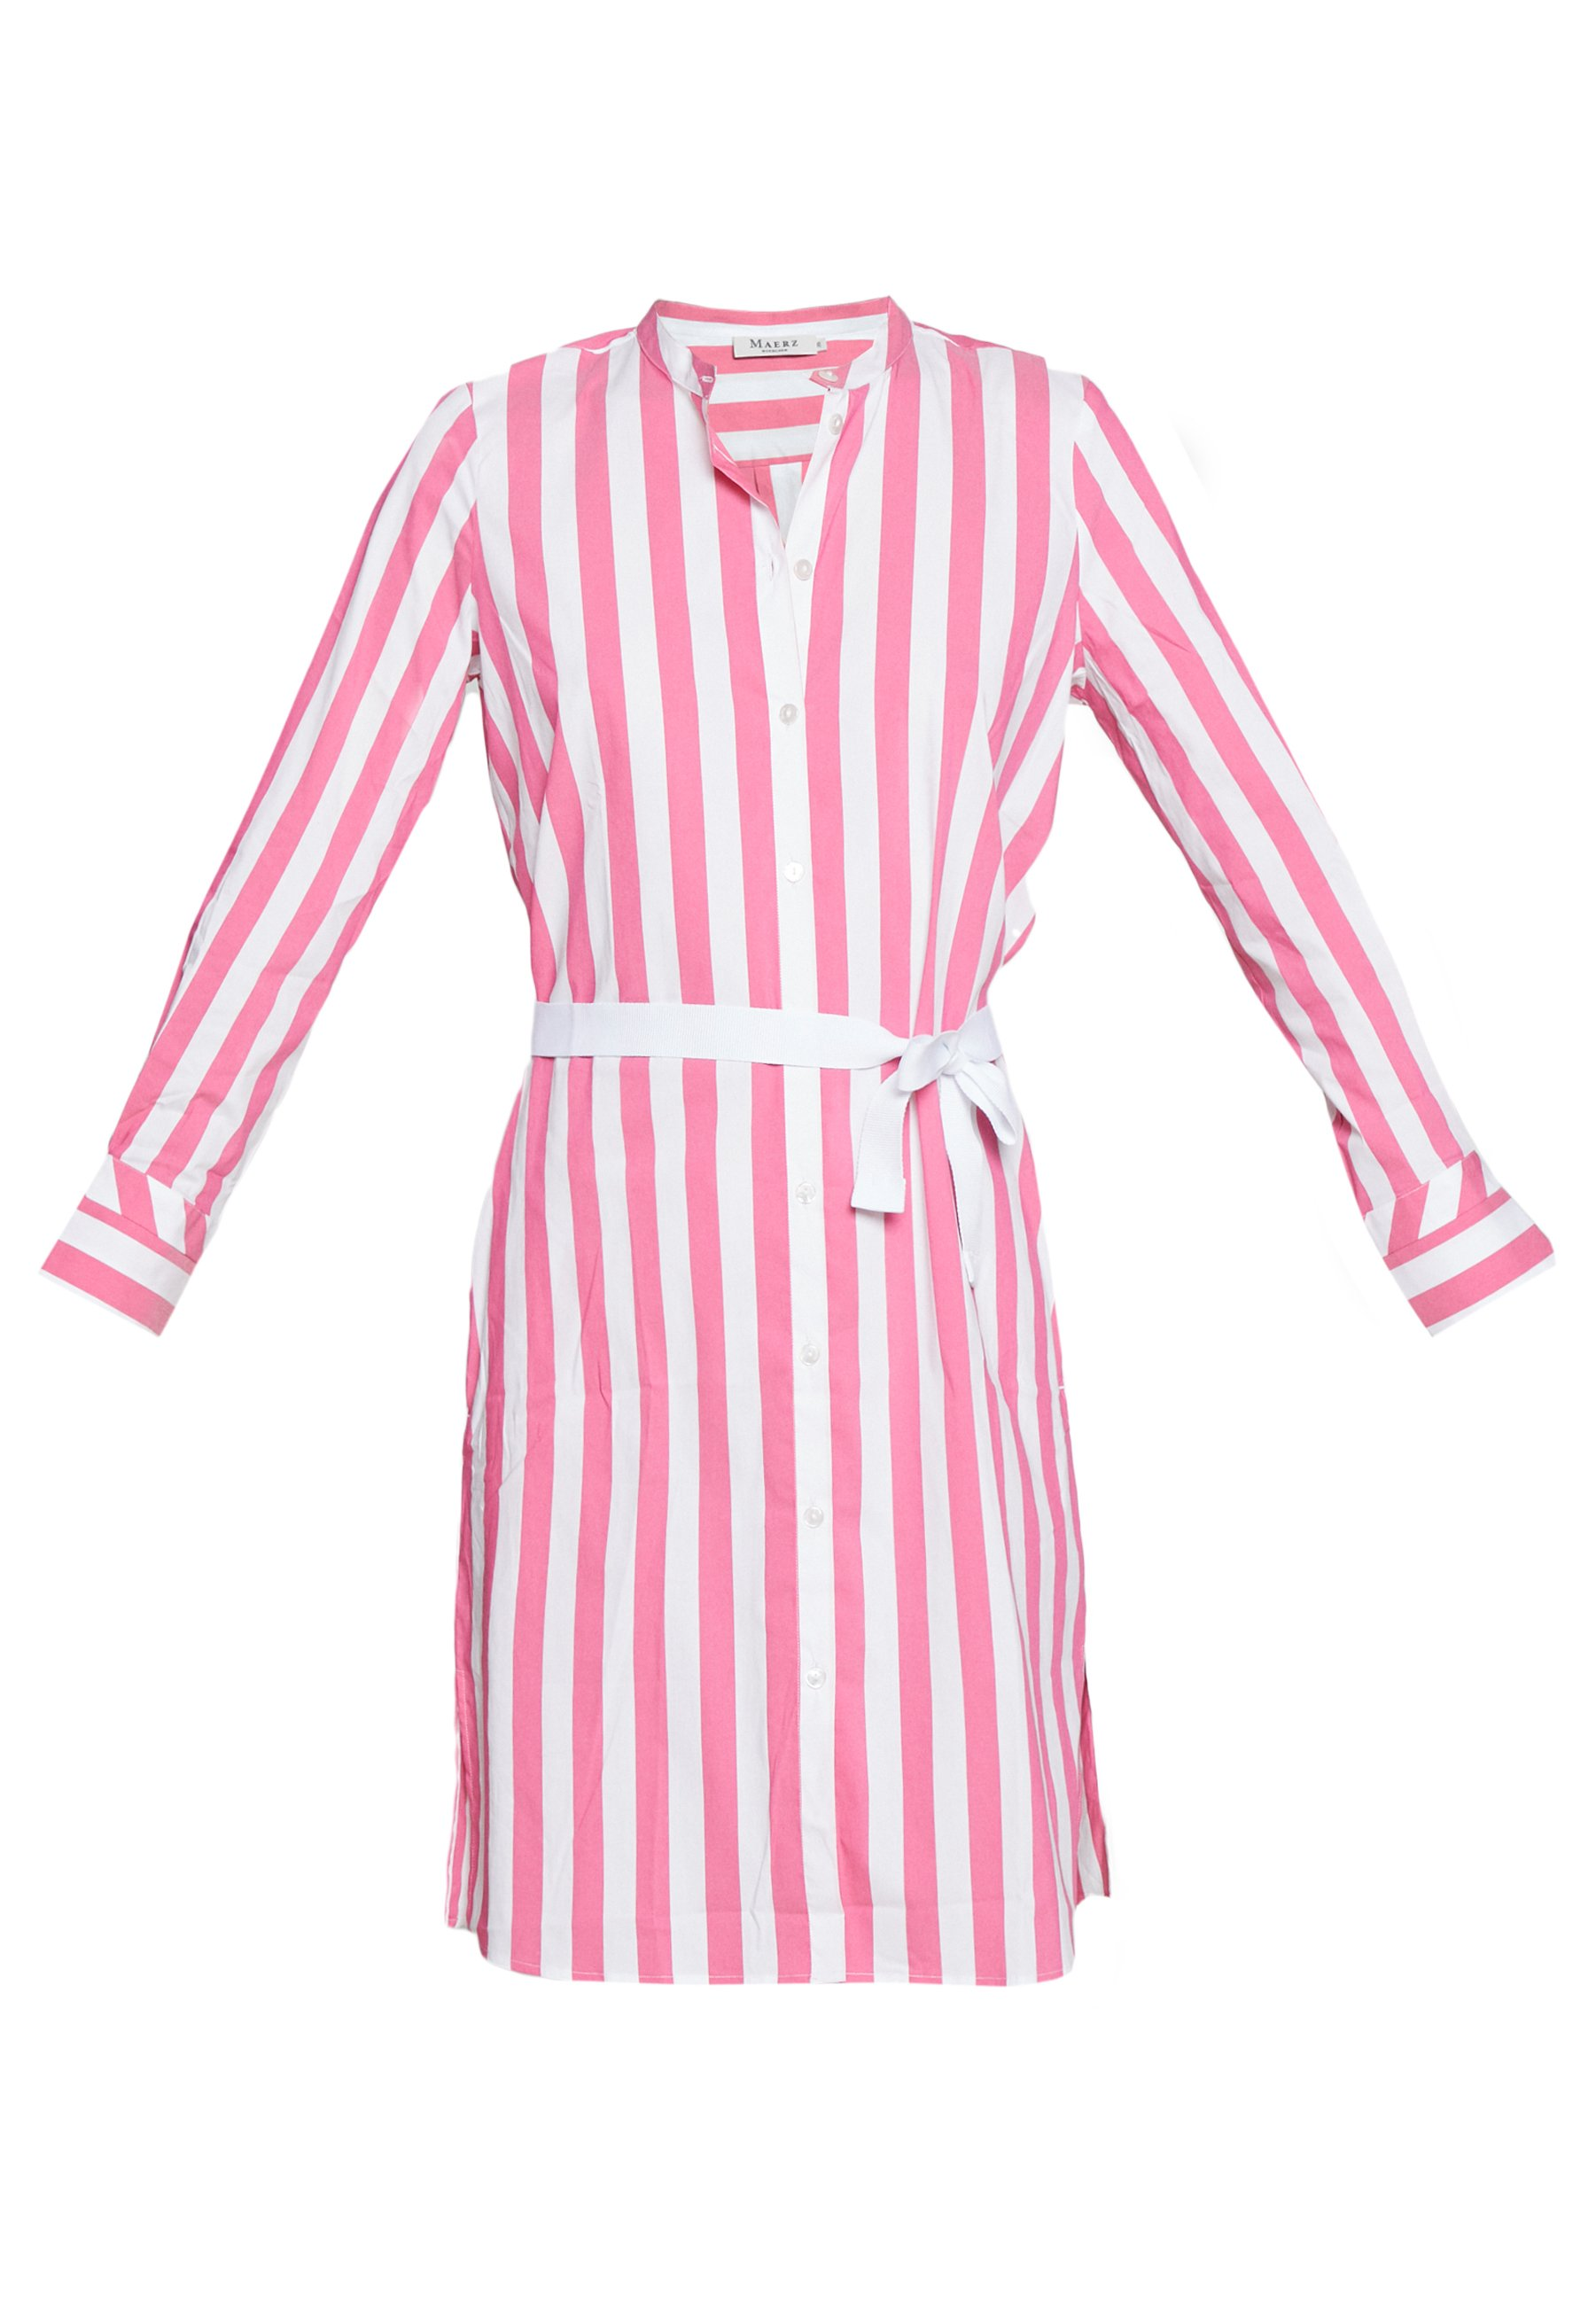 MAERZ Muenchen Shirt dress - magenta